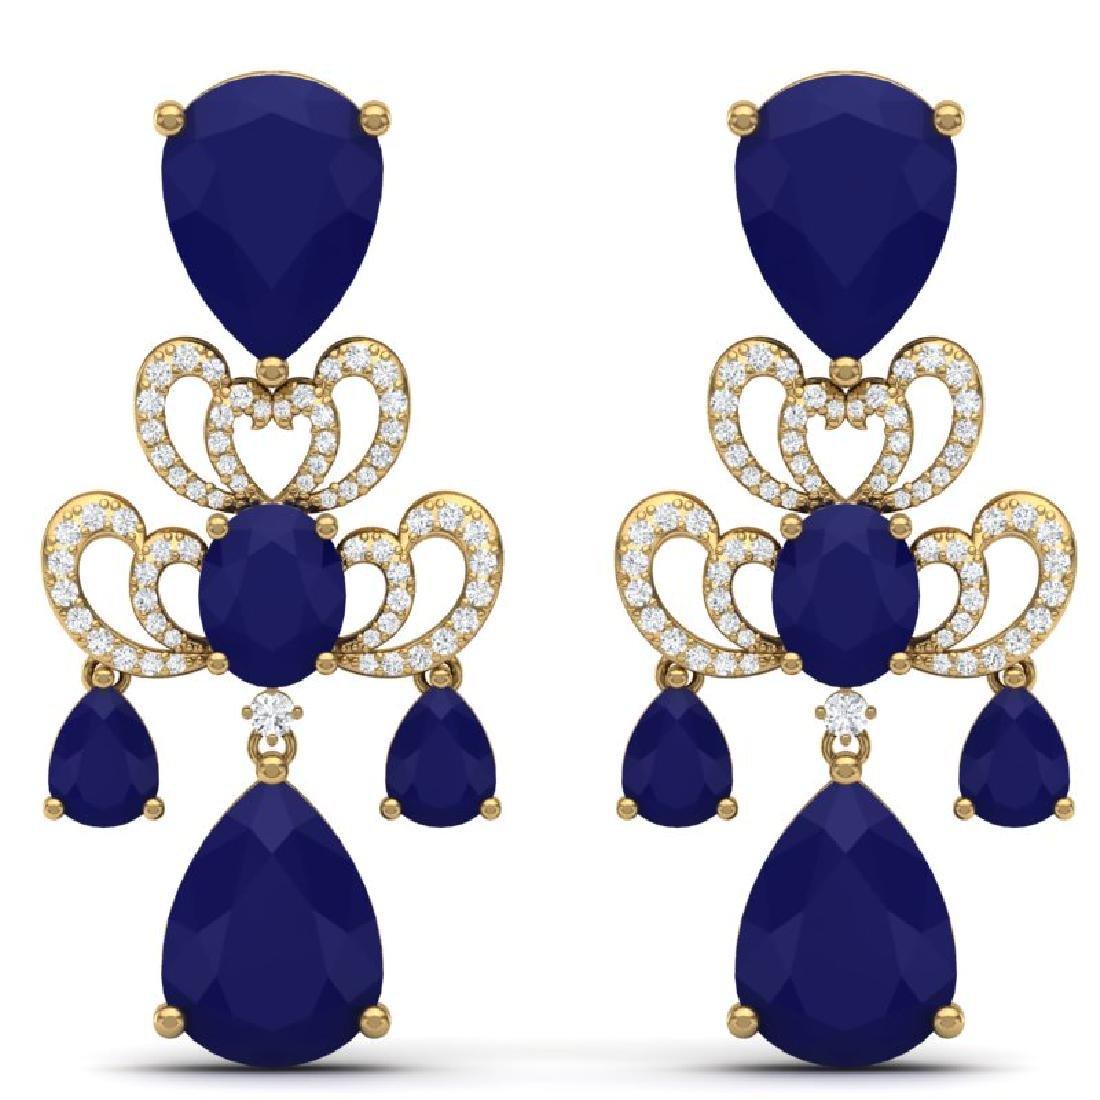 58.73 CTW Royalty Sapphire & VS Diamond Earrings 18K